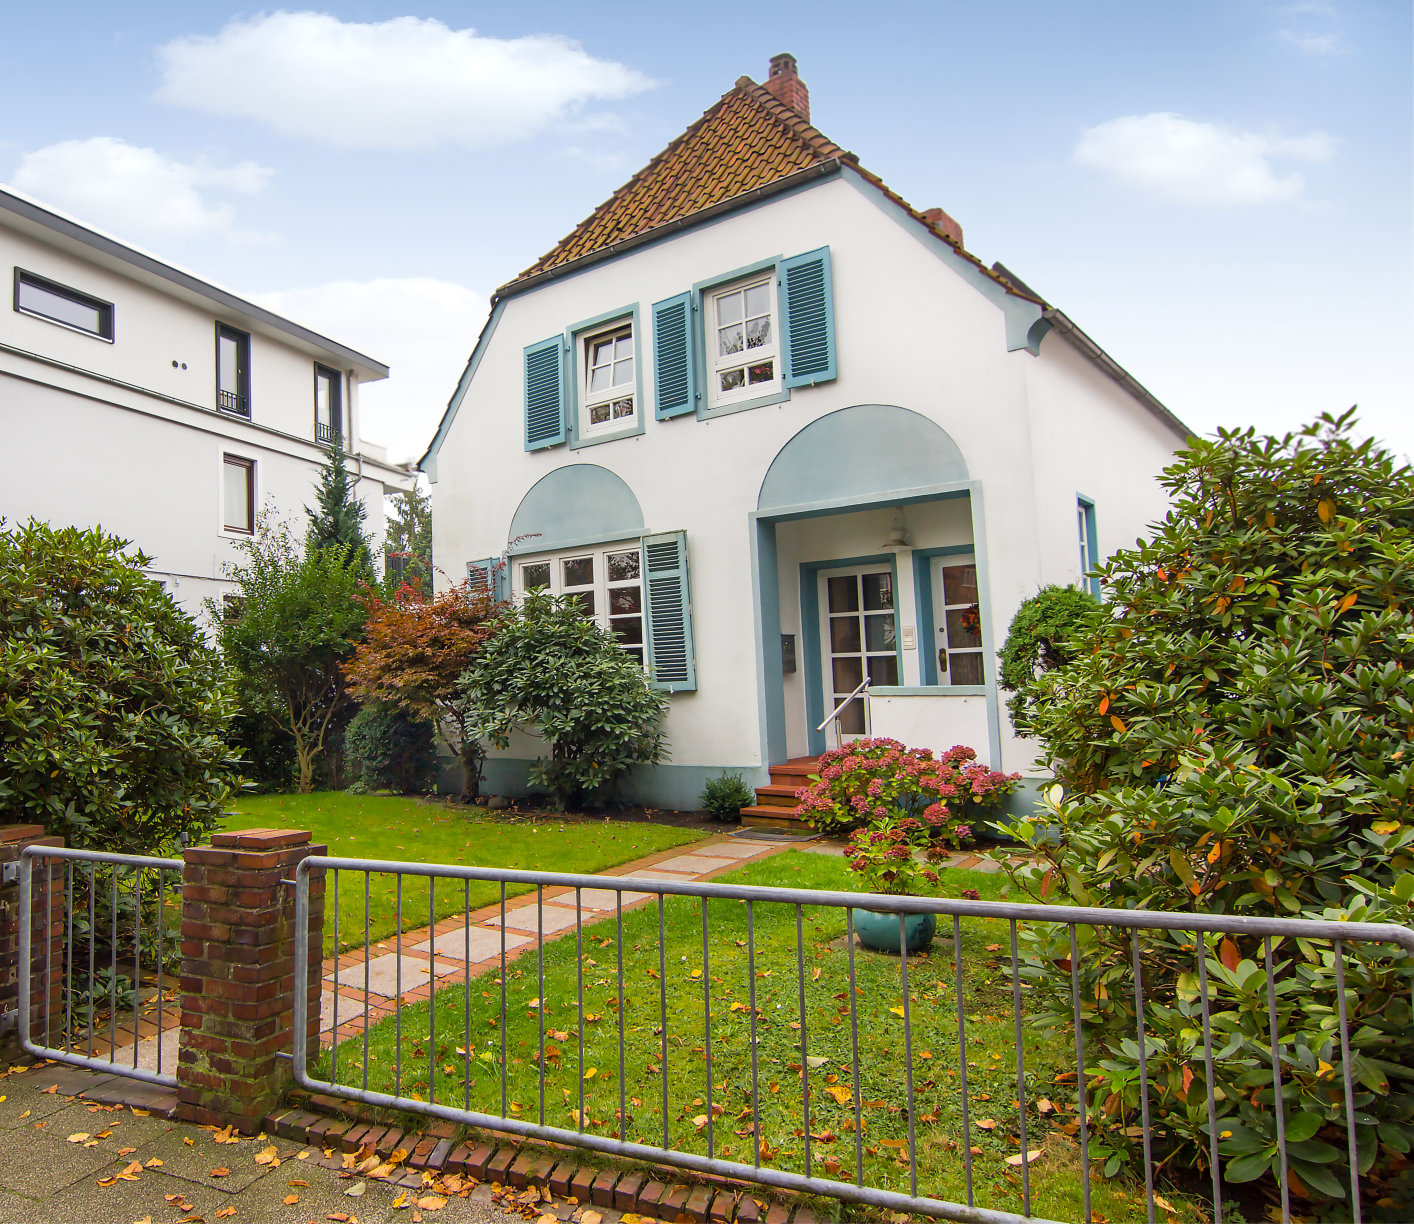 horn 1 2 familienhaus mit viel charme rosenbusch immobilienrosenbusch immobilien. Black Bedroom Furniture Sets. Home Design Ideas